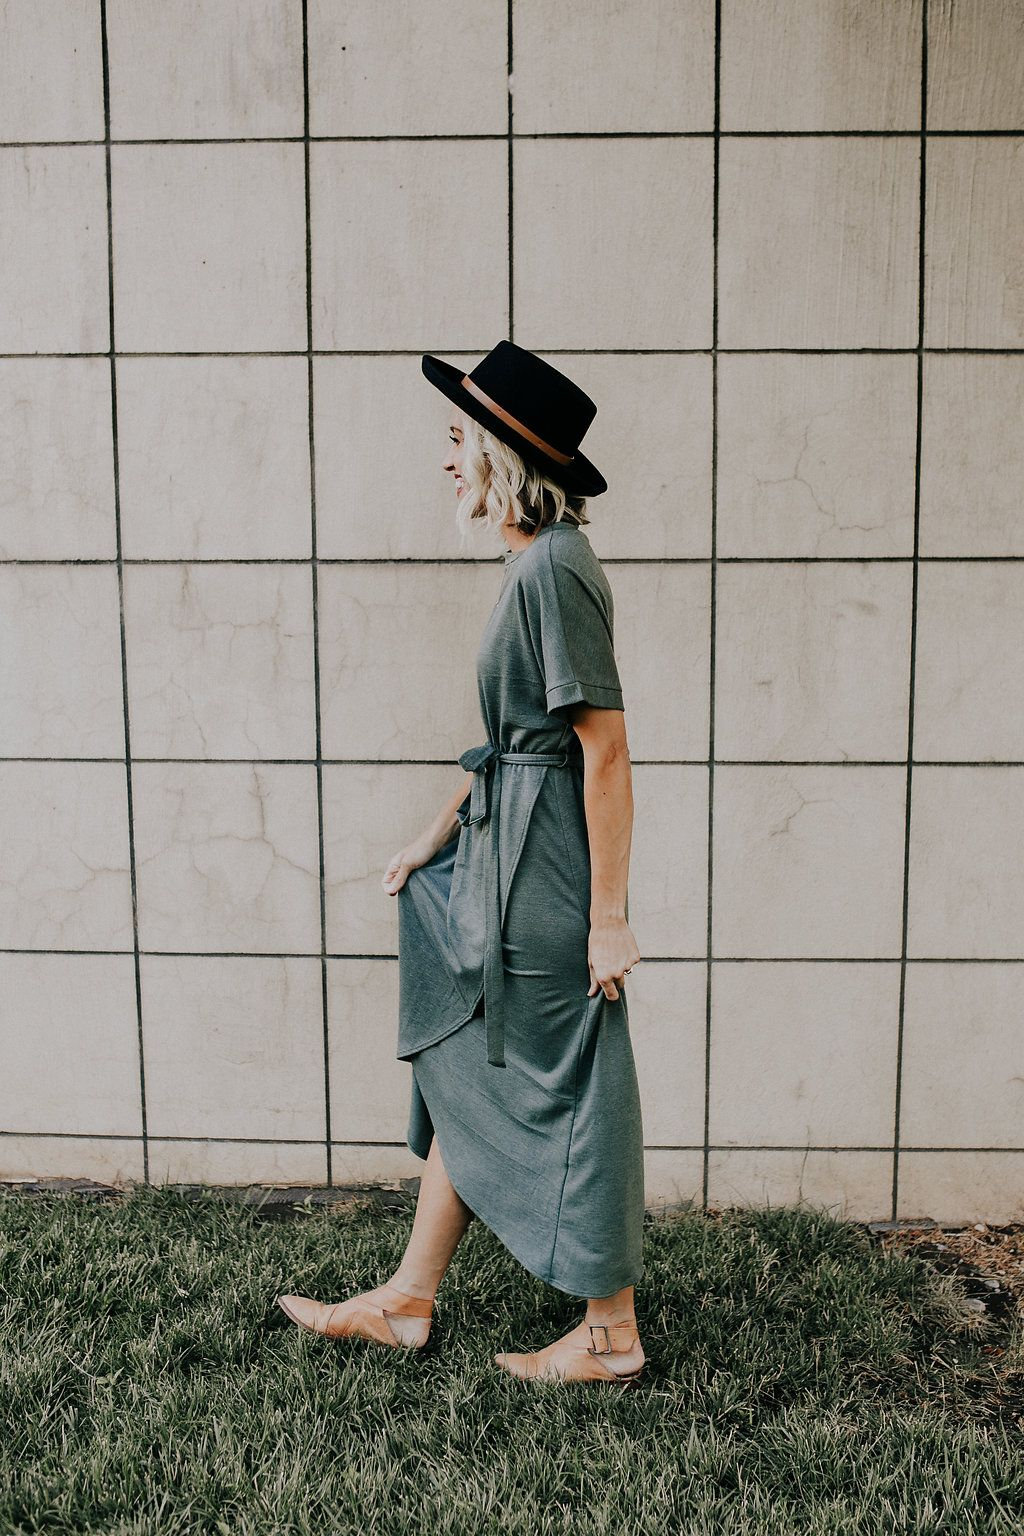 c32ae713 Ginger Black - Women's Gambler Hat   apparel.   Hipster hat, Fashion ...